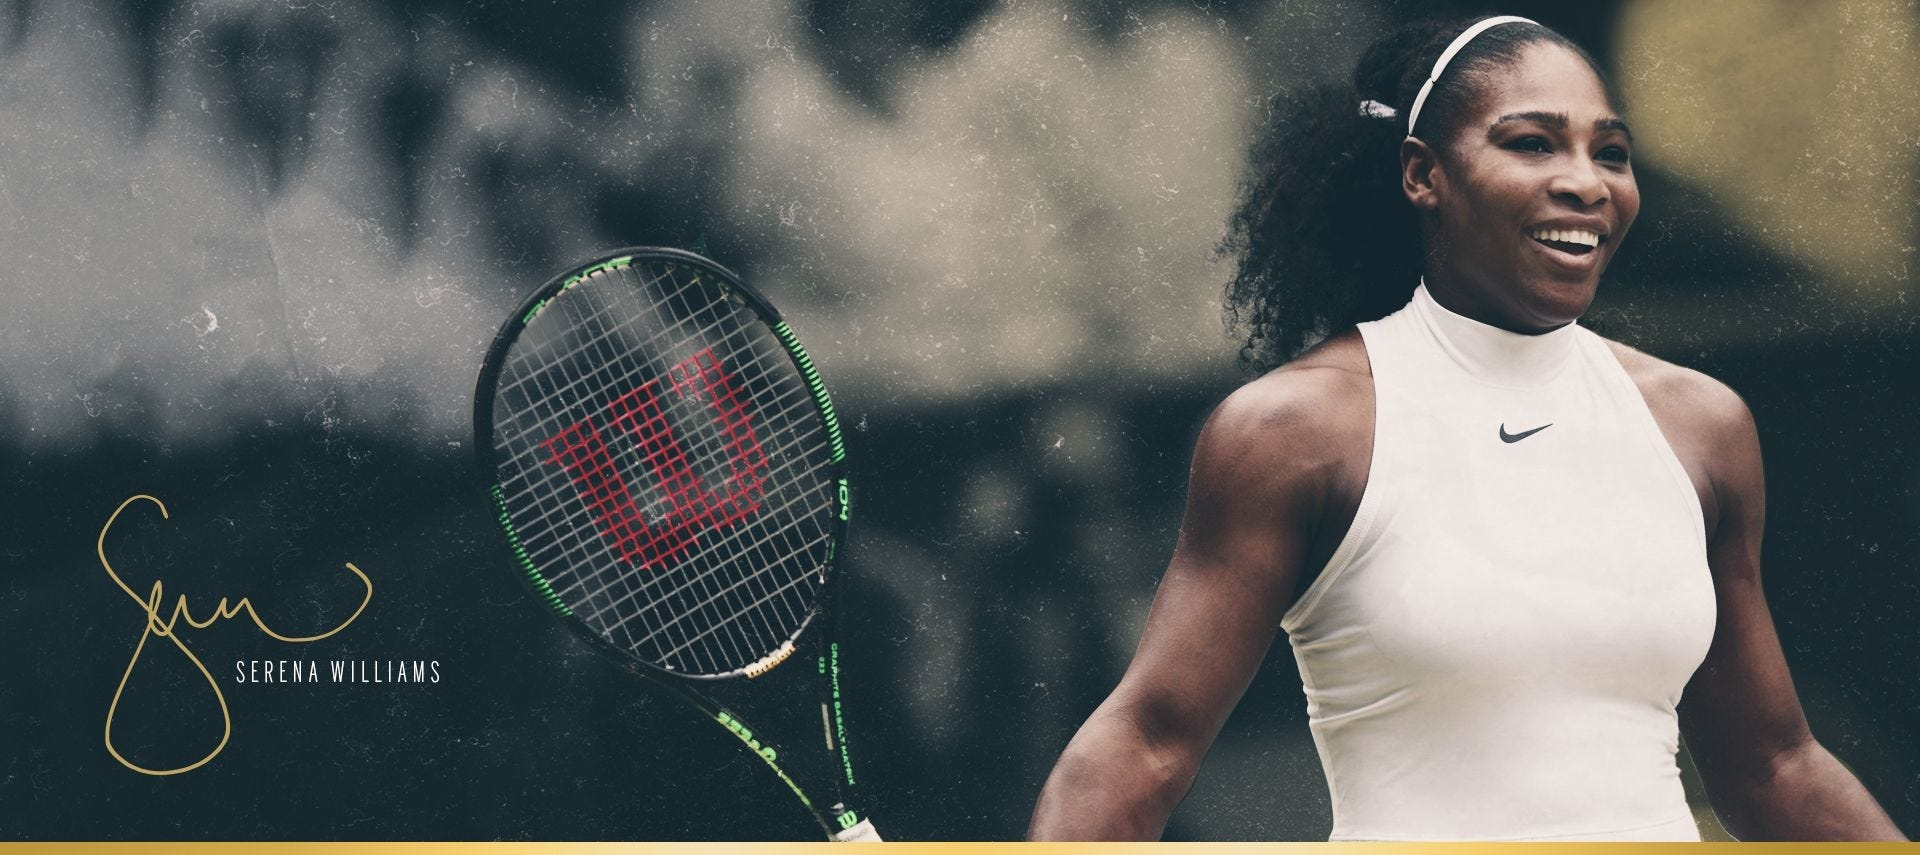 The Serena Williams Autograph Tennis Racket - Blade 104 - Wilson